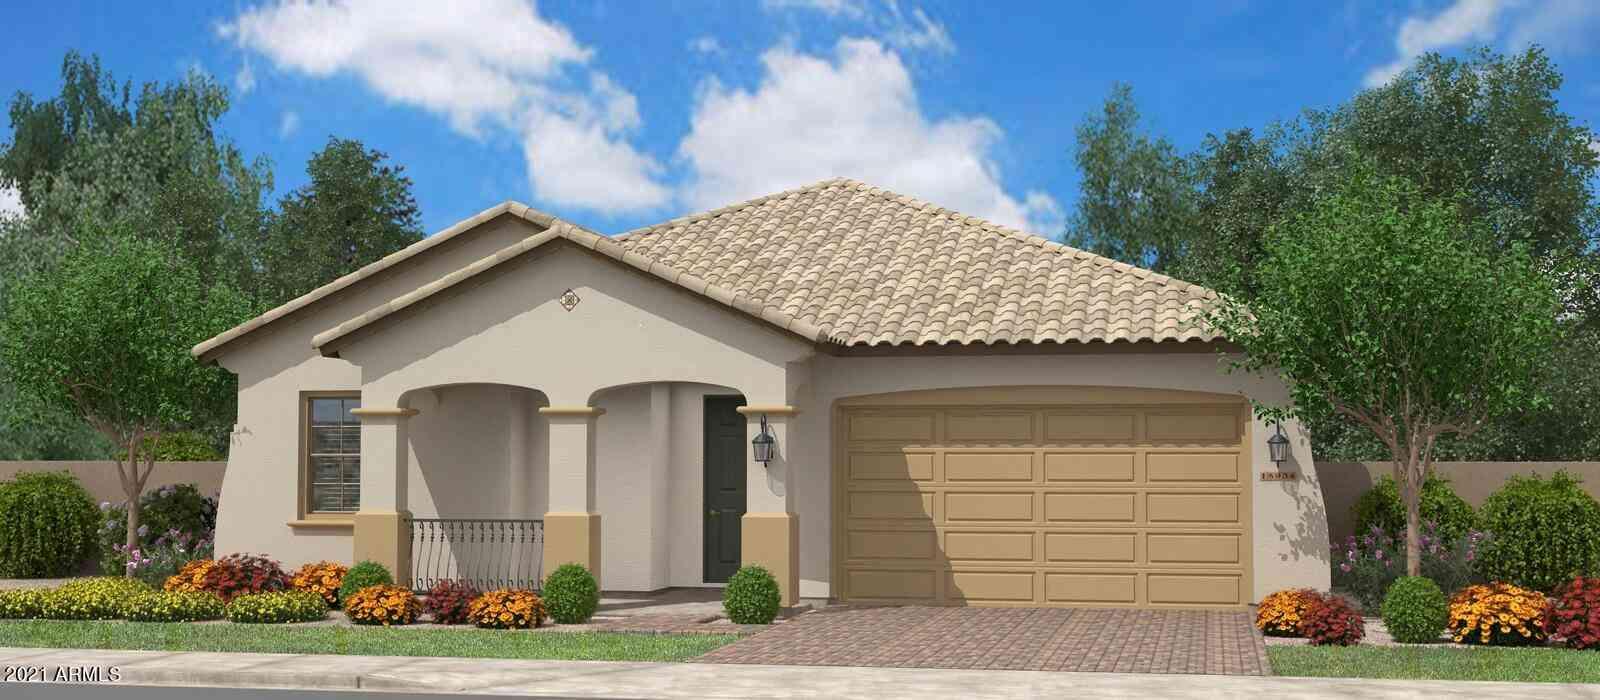 41757 W LARAMIE Road, Maricopa, AZ, 85138,